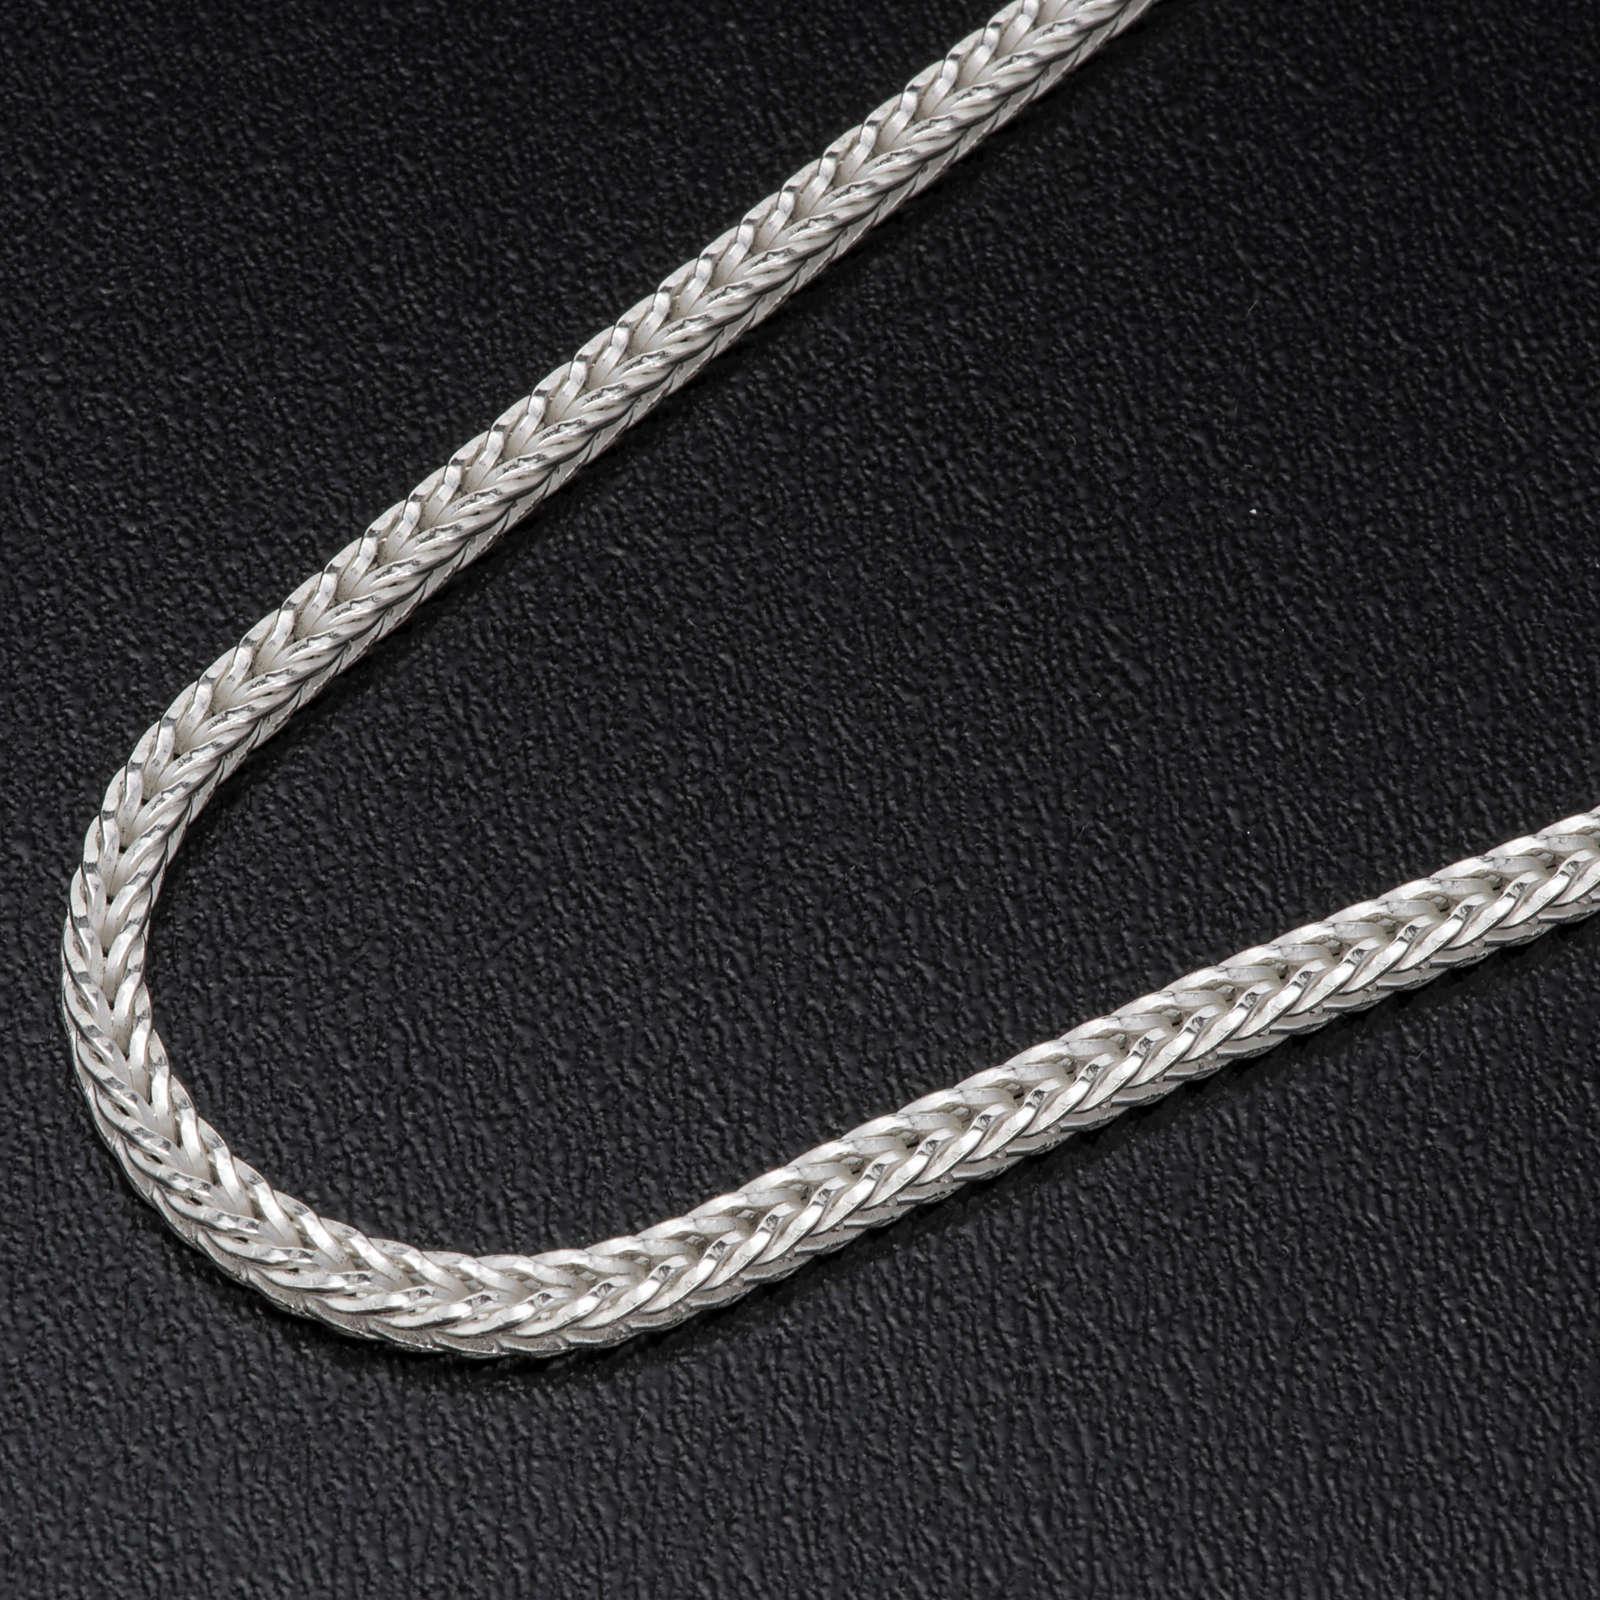 Silver wheat chain for pectoral cross, 90 cm long 3